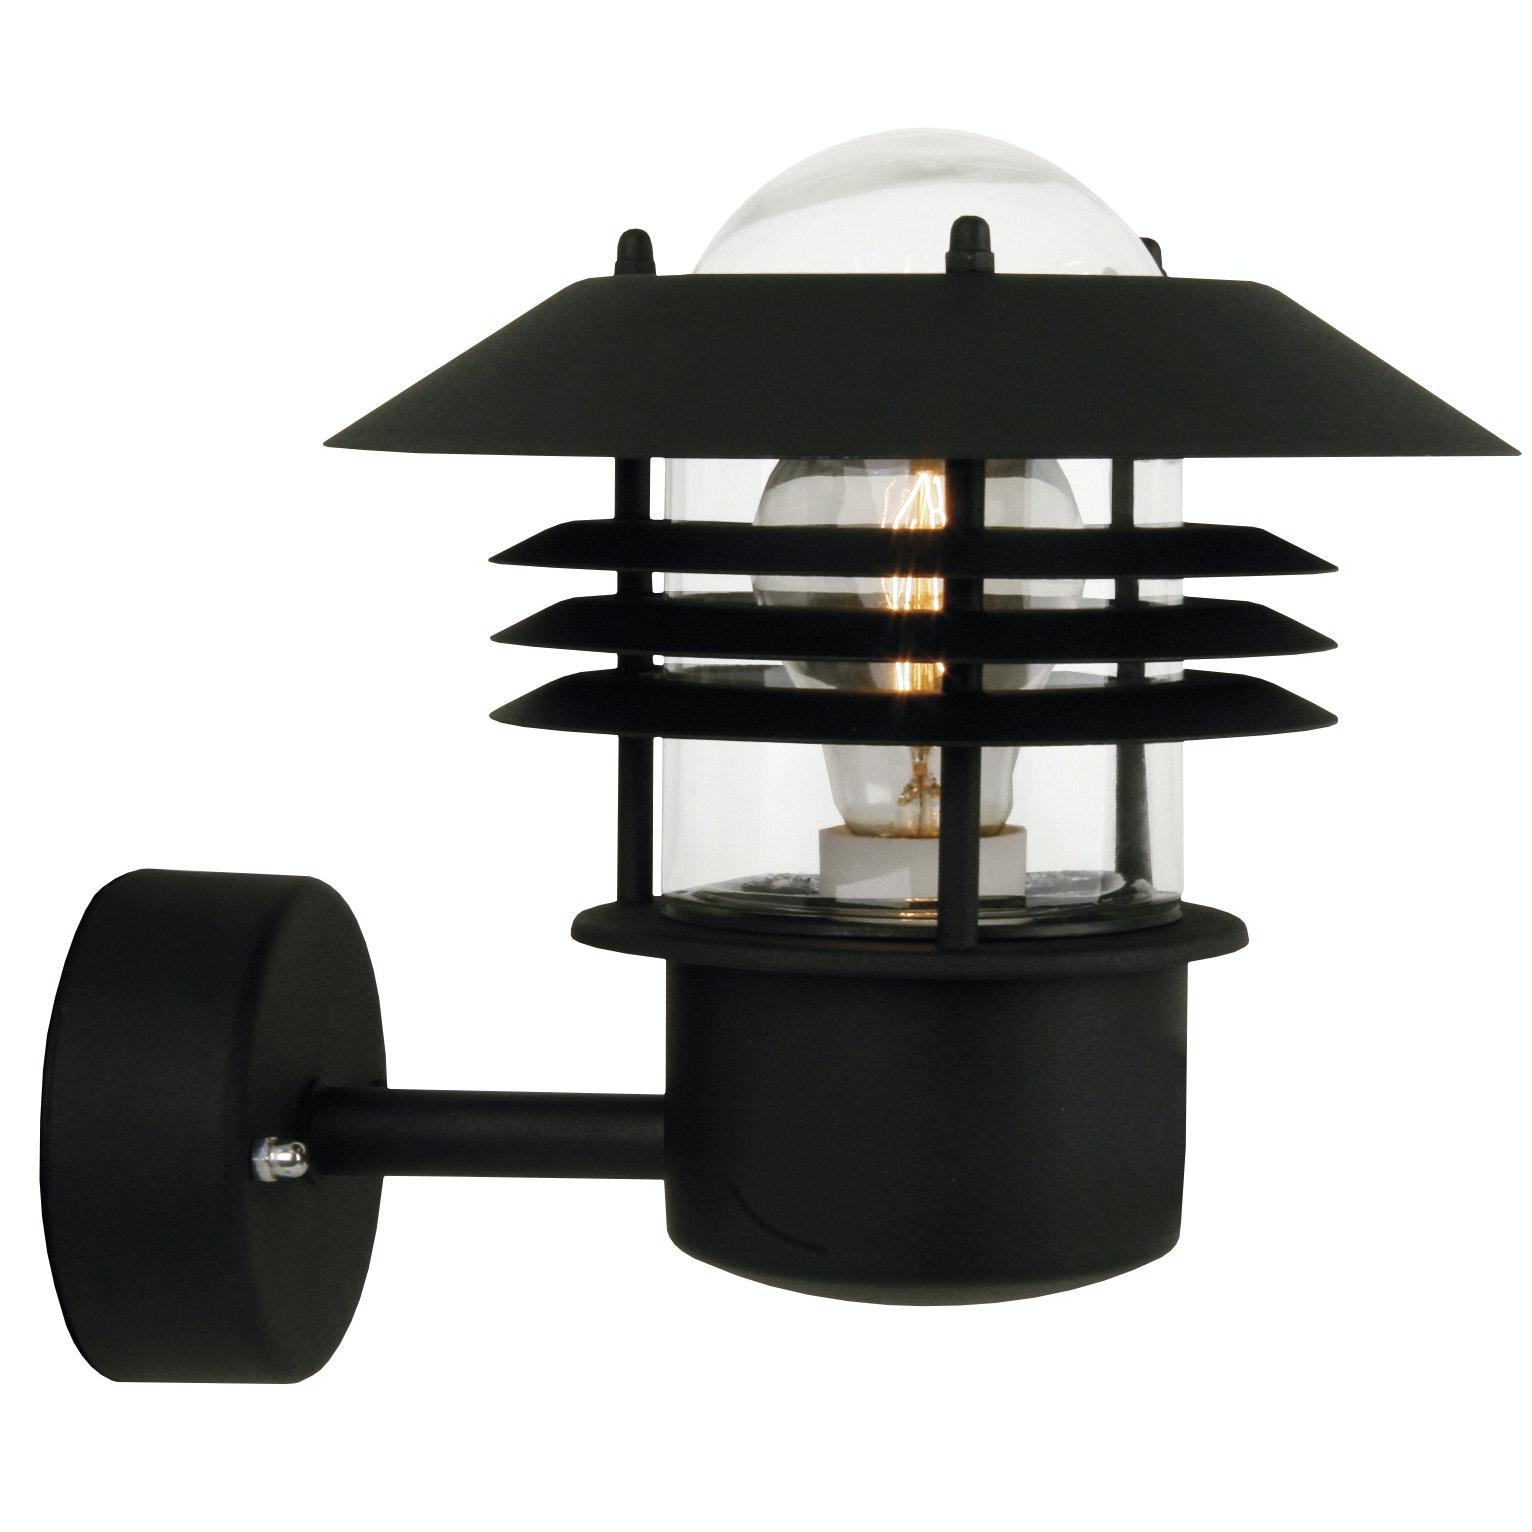 Utevägglampa Vejers Svart IP54